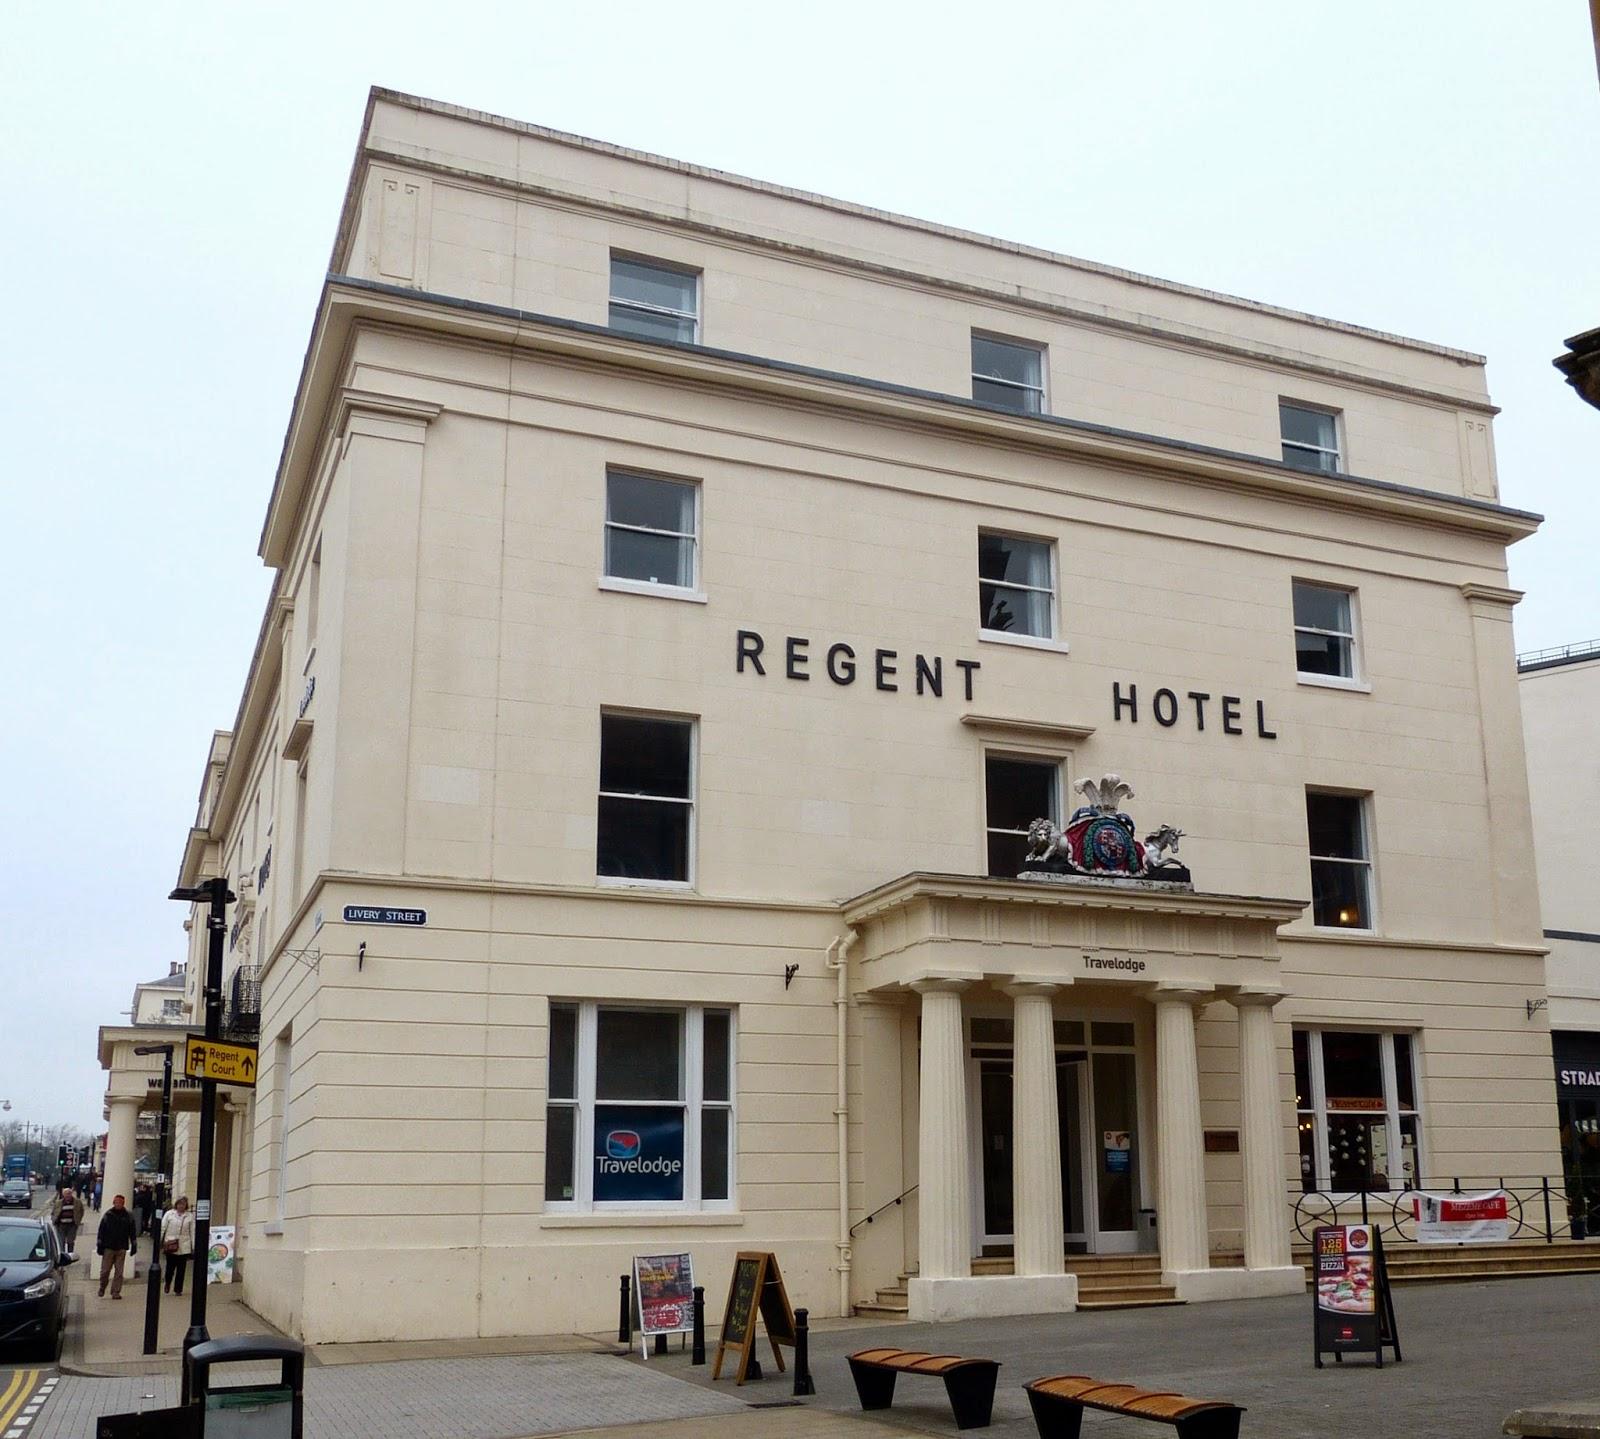 Regent Hotel, Leamington